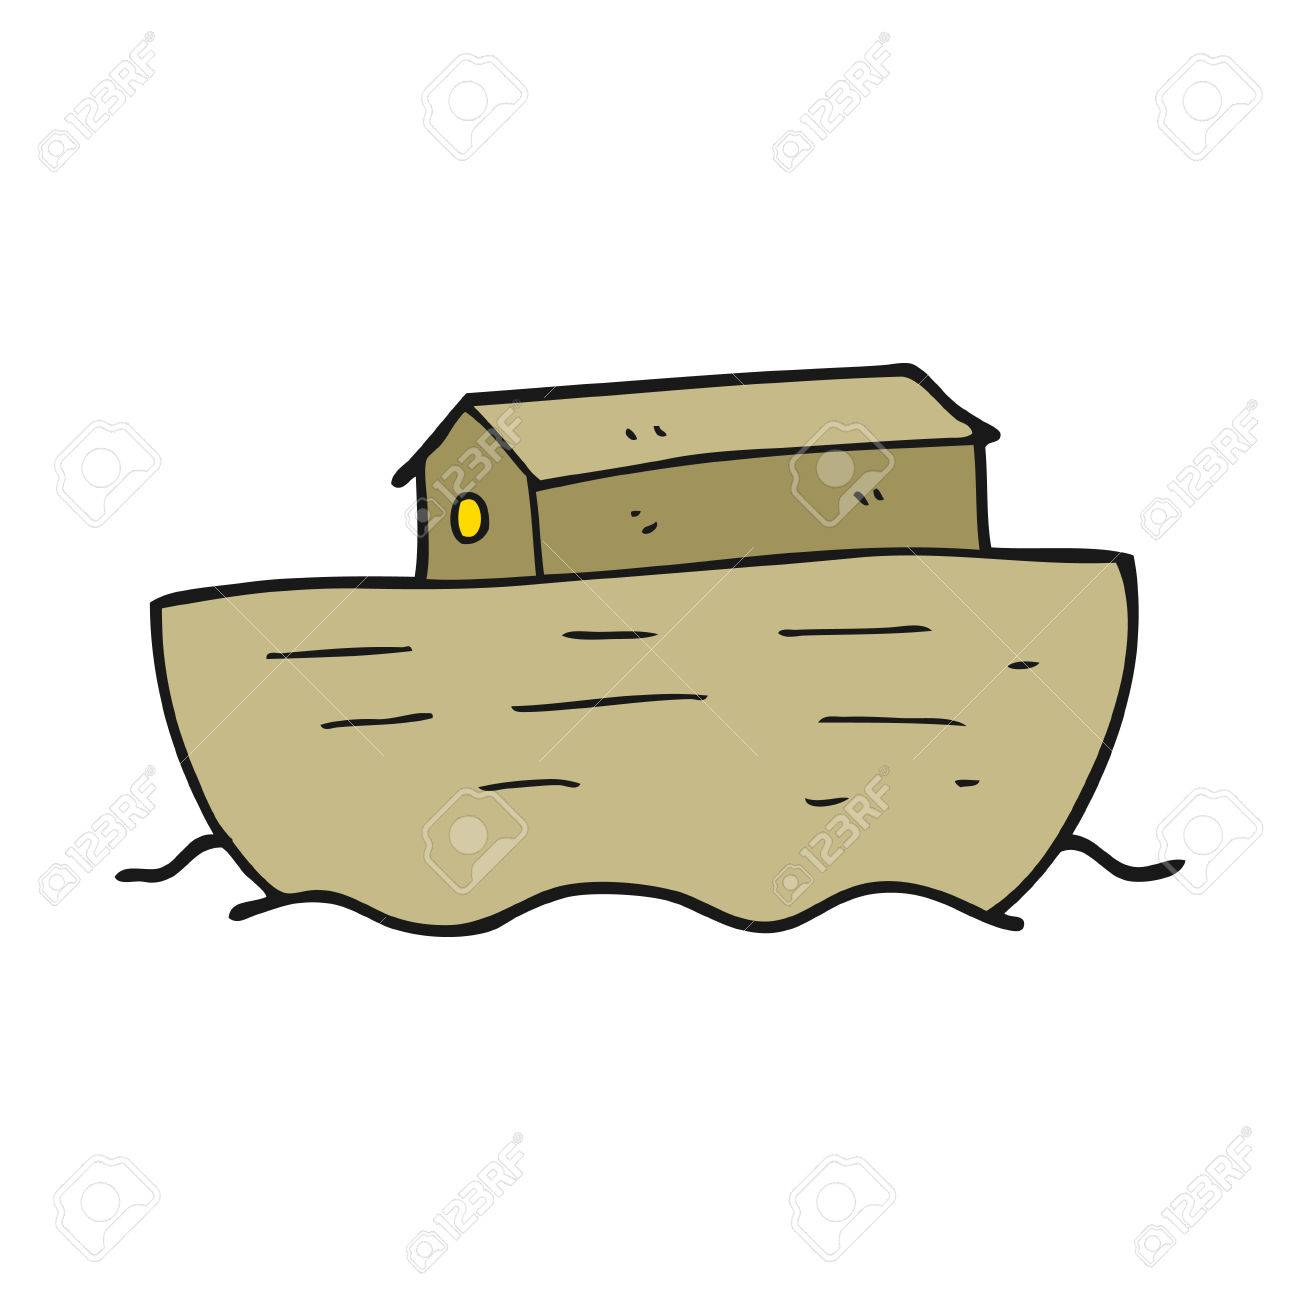 1300x1300 Freehand Drawn Cartoon Noah's Ark Royalty Free Cliparts, Vectors